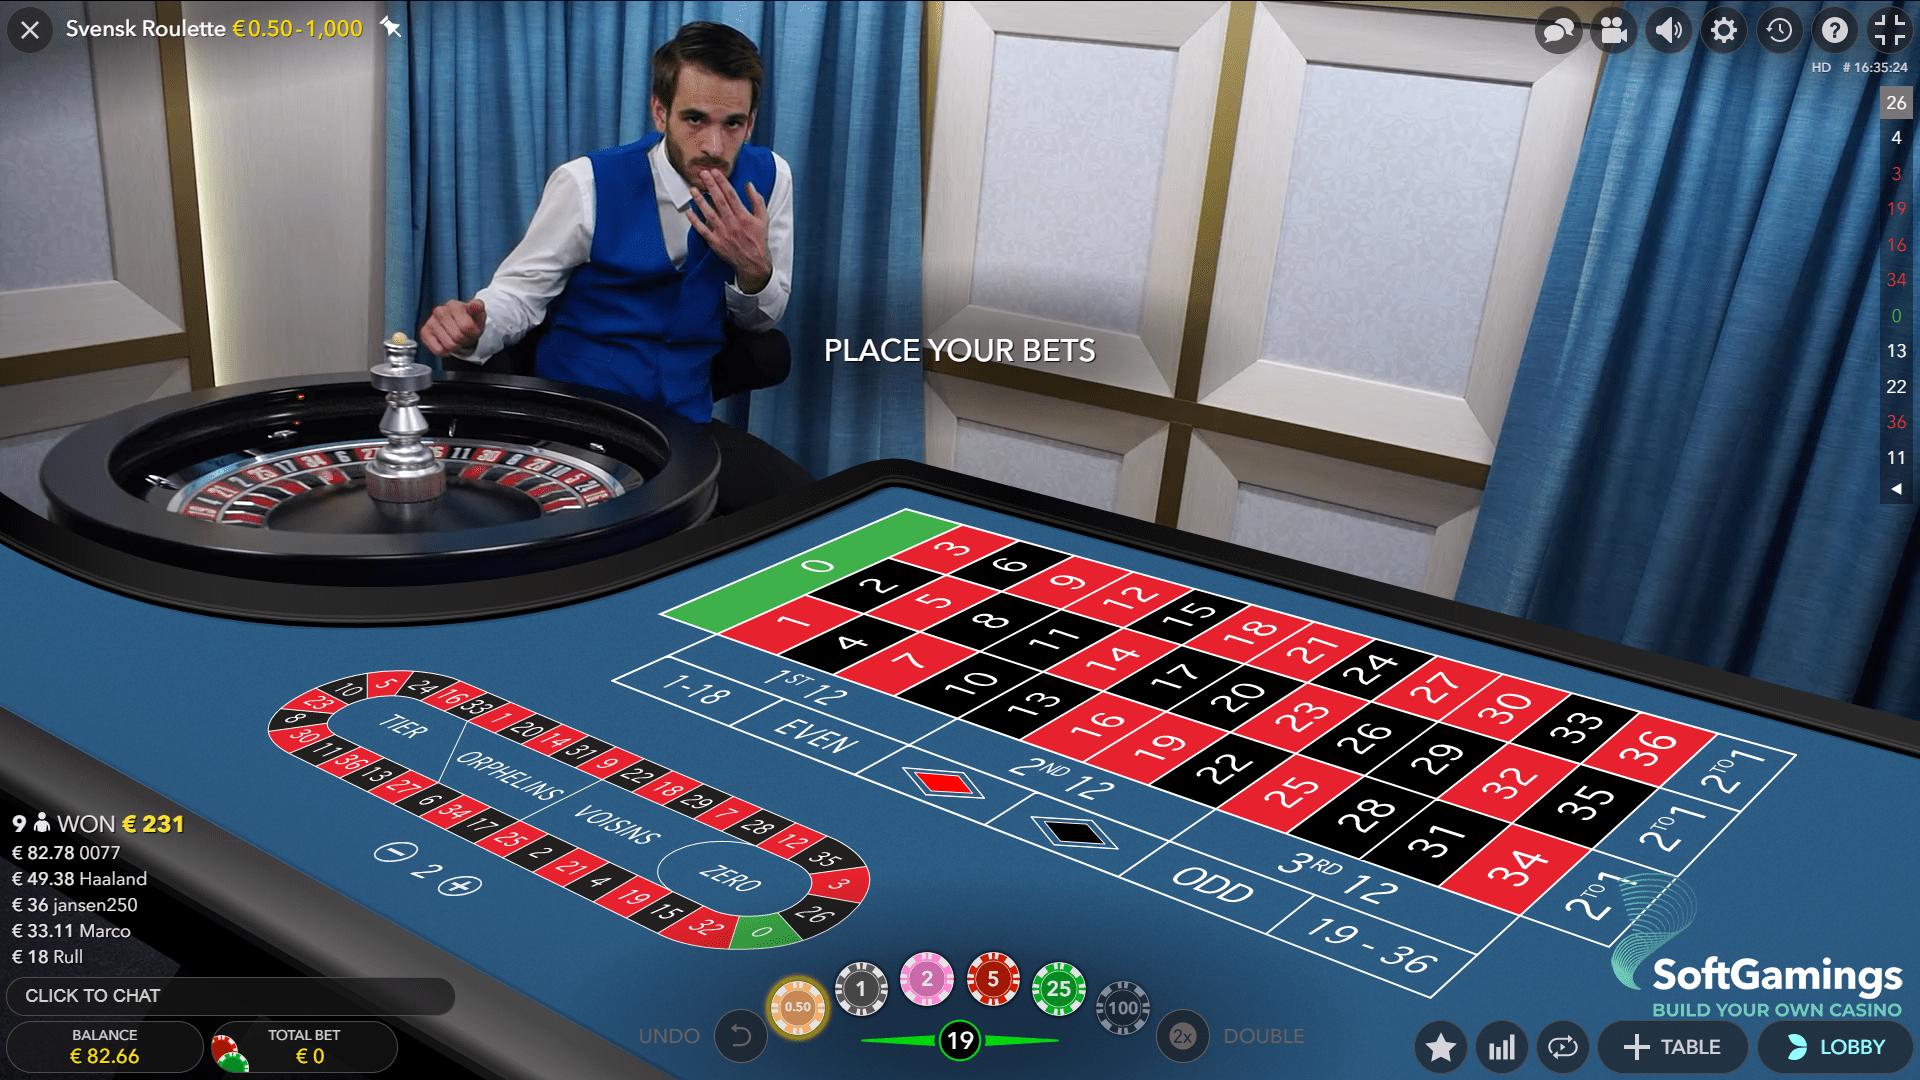 Autoplay casino Brasil poker 62571